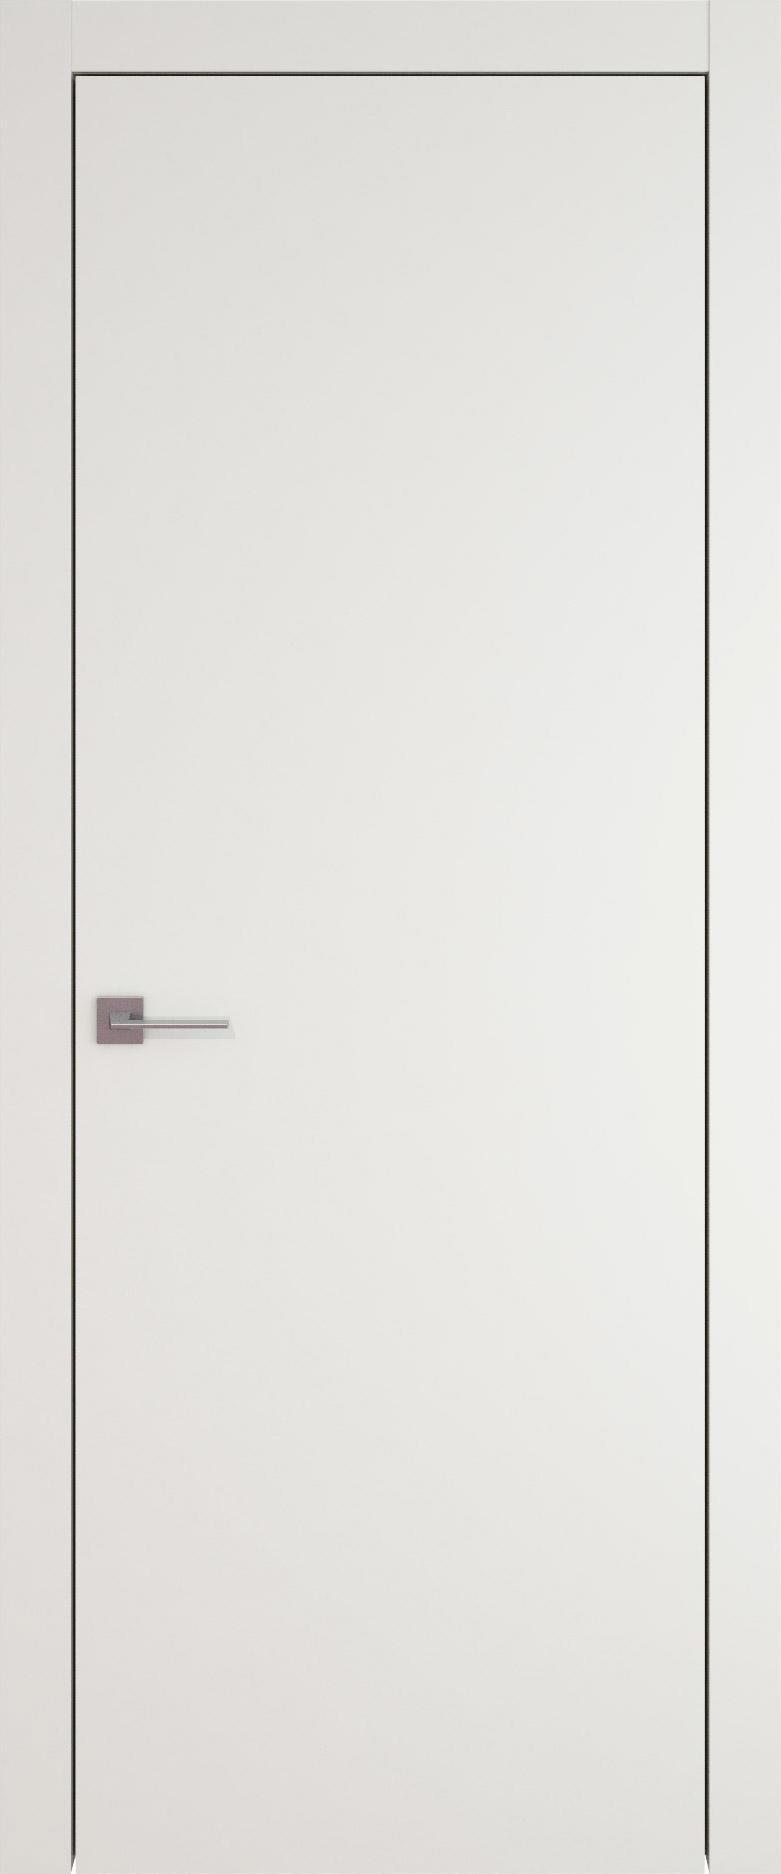 Tivoli А-1 цвет - Бежевая эмаль (RAL 9010) Без стекла (ДГ)